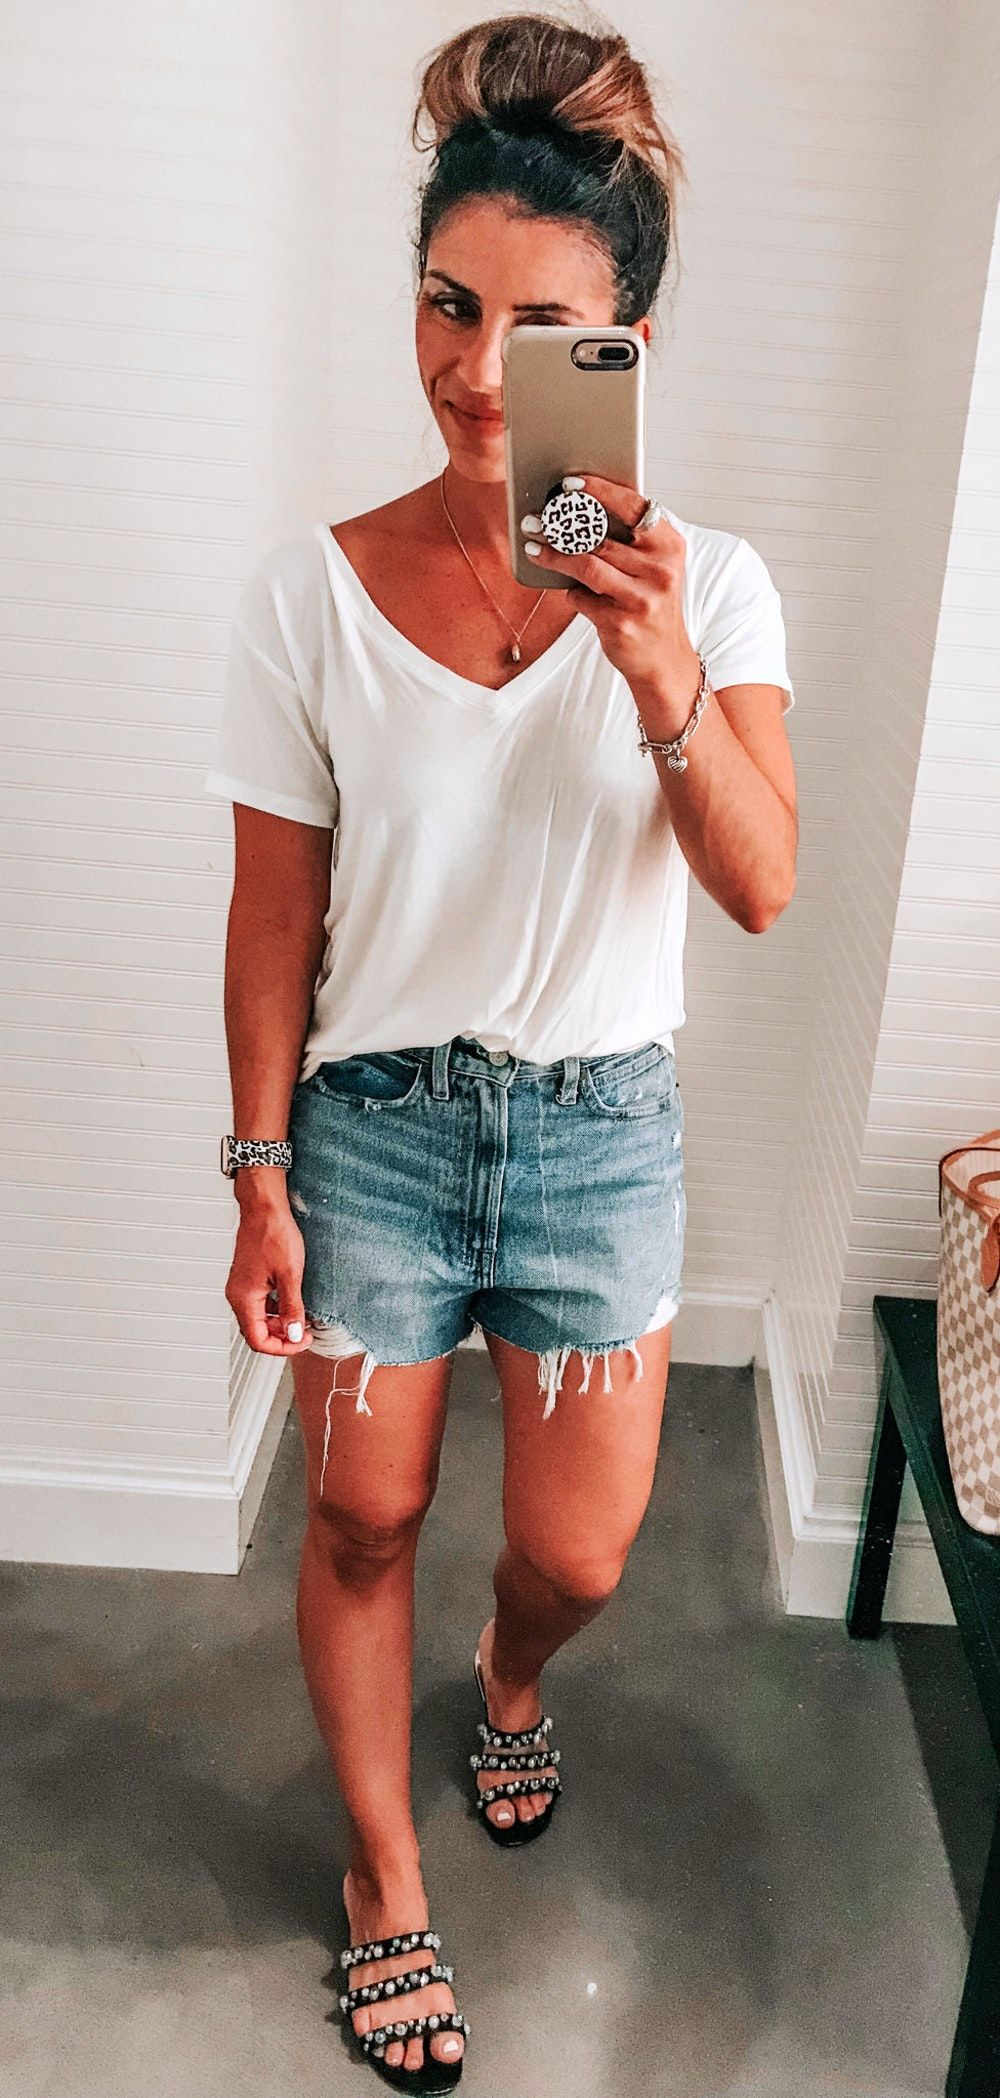 #summer #outfits white V-neck shirt and blue denim shorts